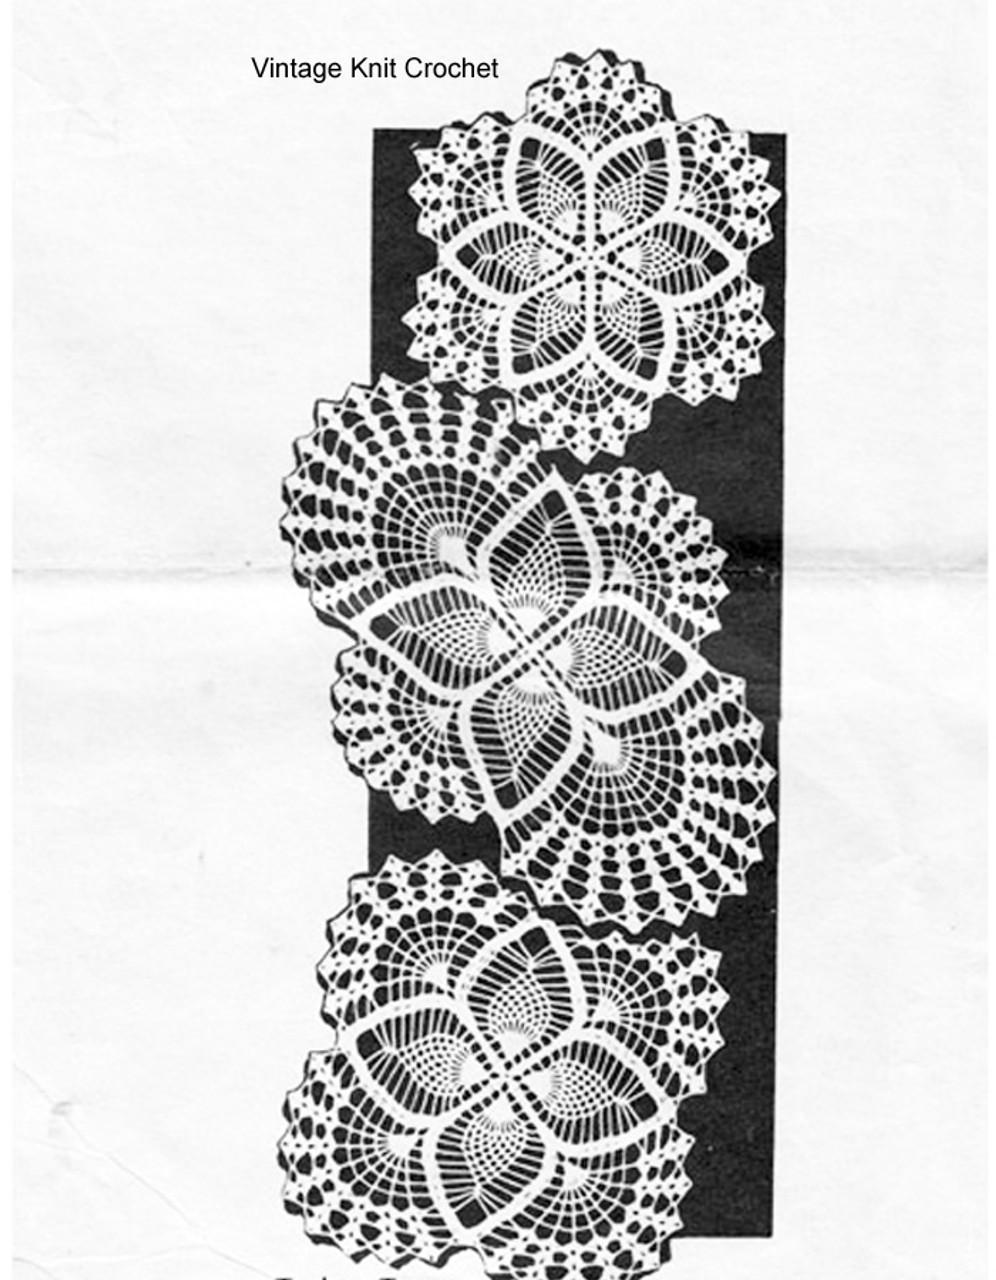 Square crochet doilies pattern, Alice Brooks 7019